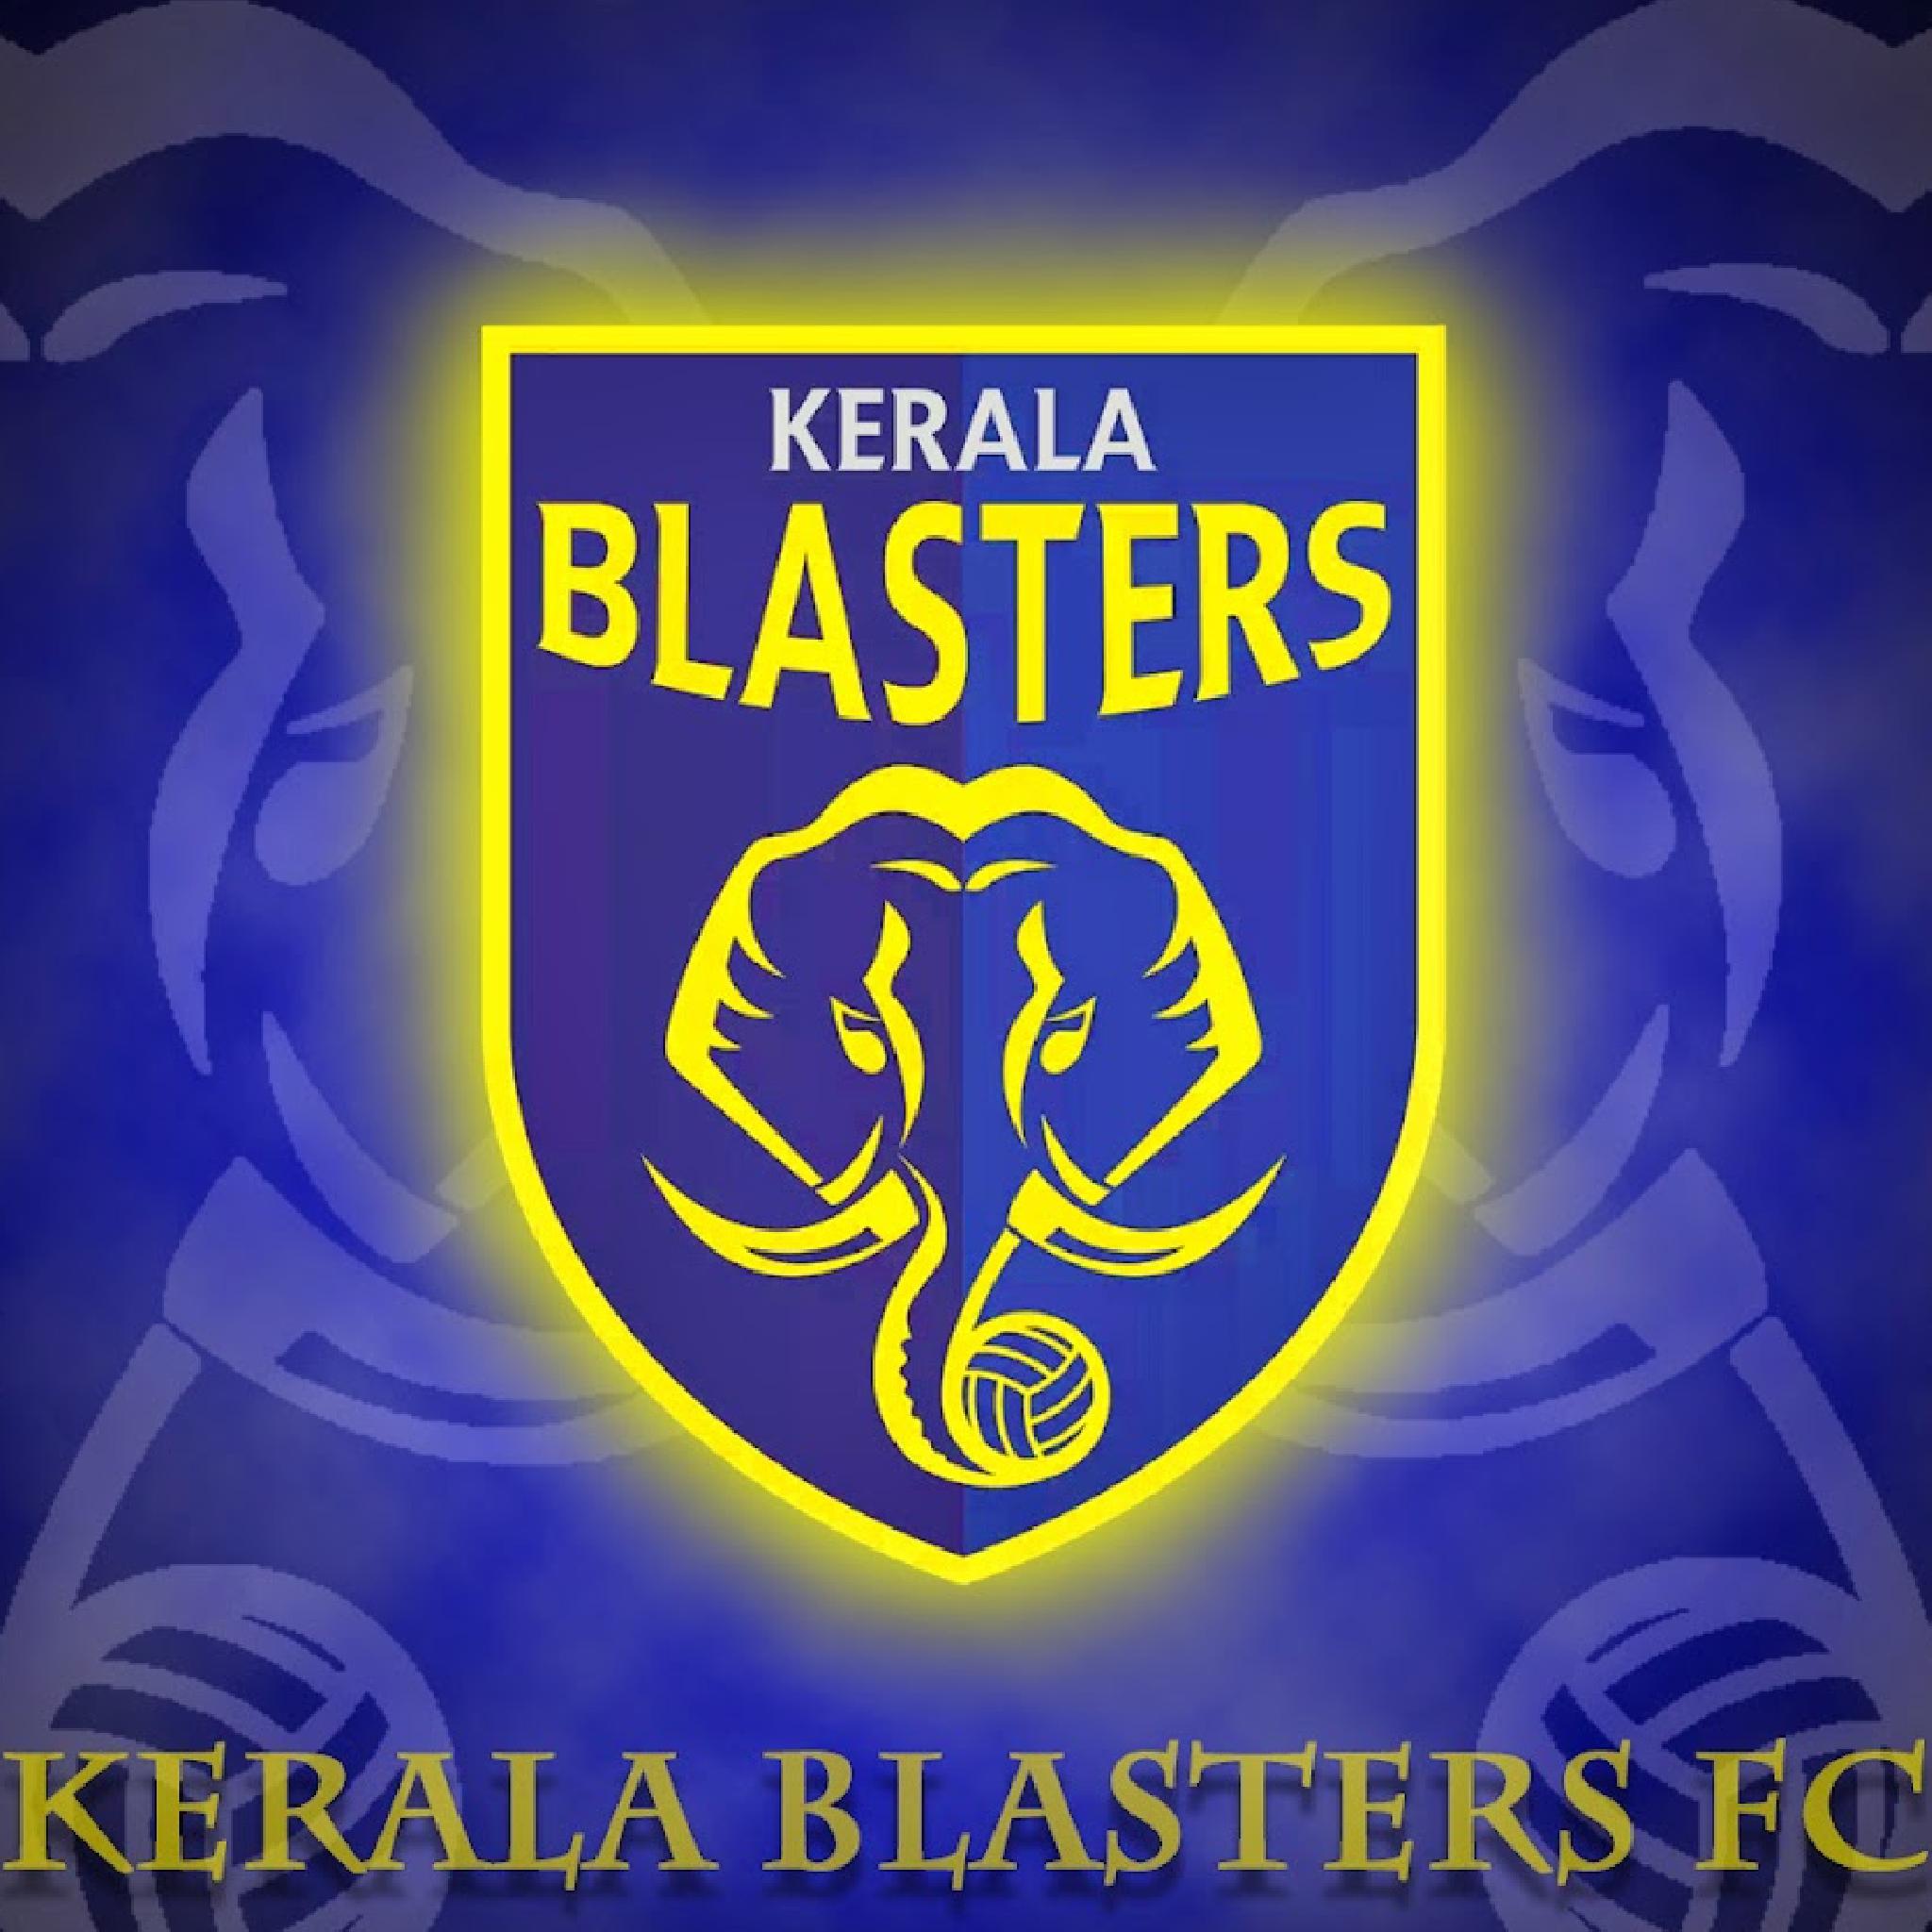 Hd Wallpapers   Kerala Blasters Hd Wallpapers backgrounds 2048x2048